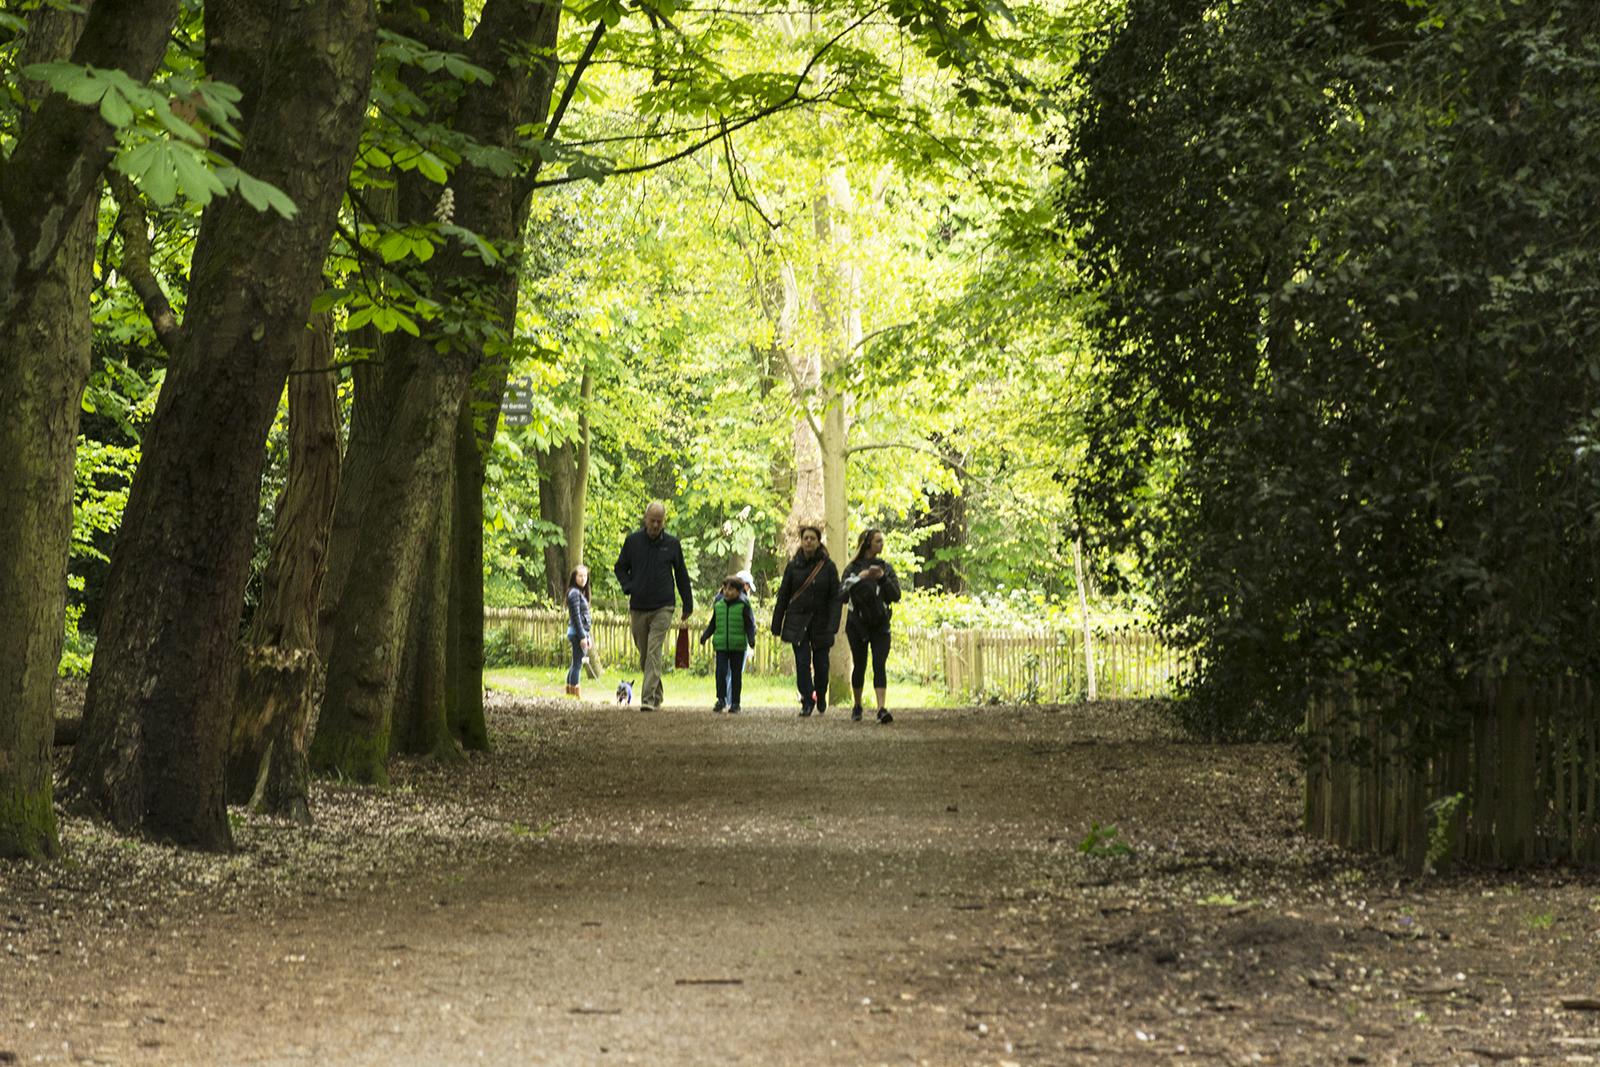 2017-04-17-Kensington-and-Chelsea_Spring_Landscape_Holland-Park-Walk-in-the-Park